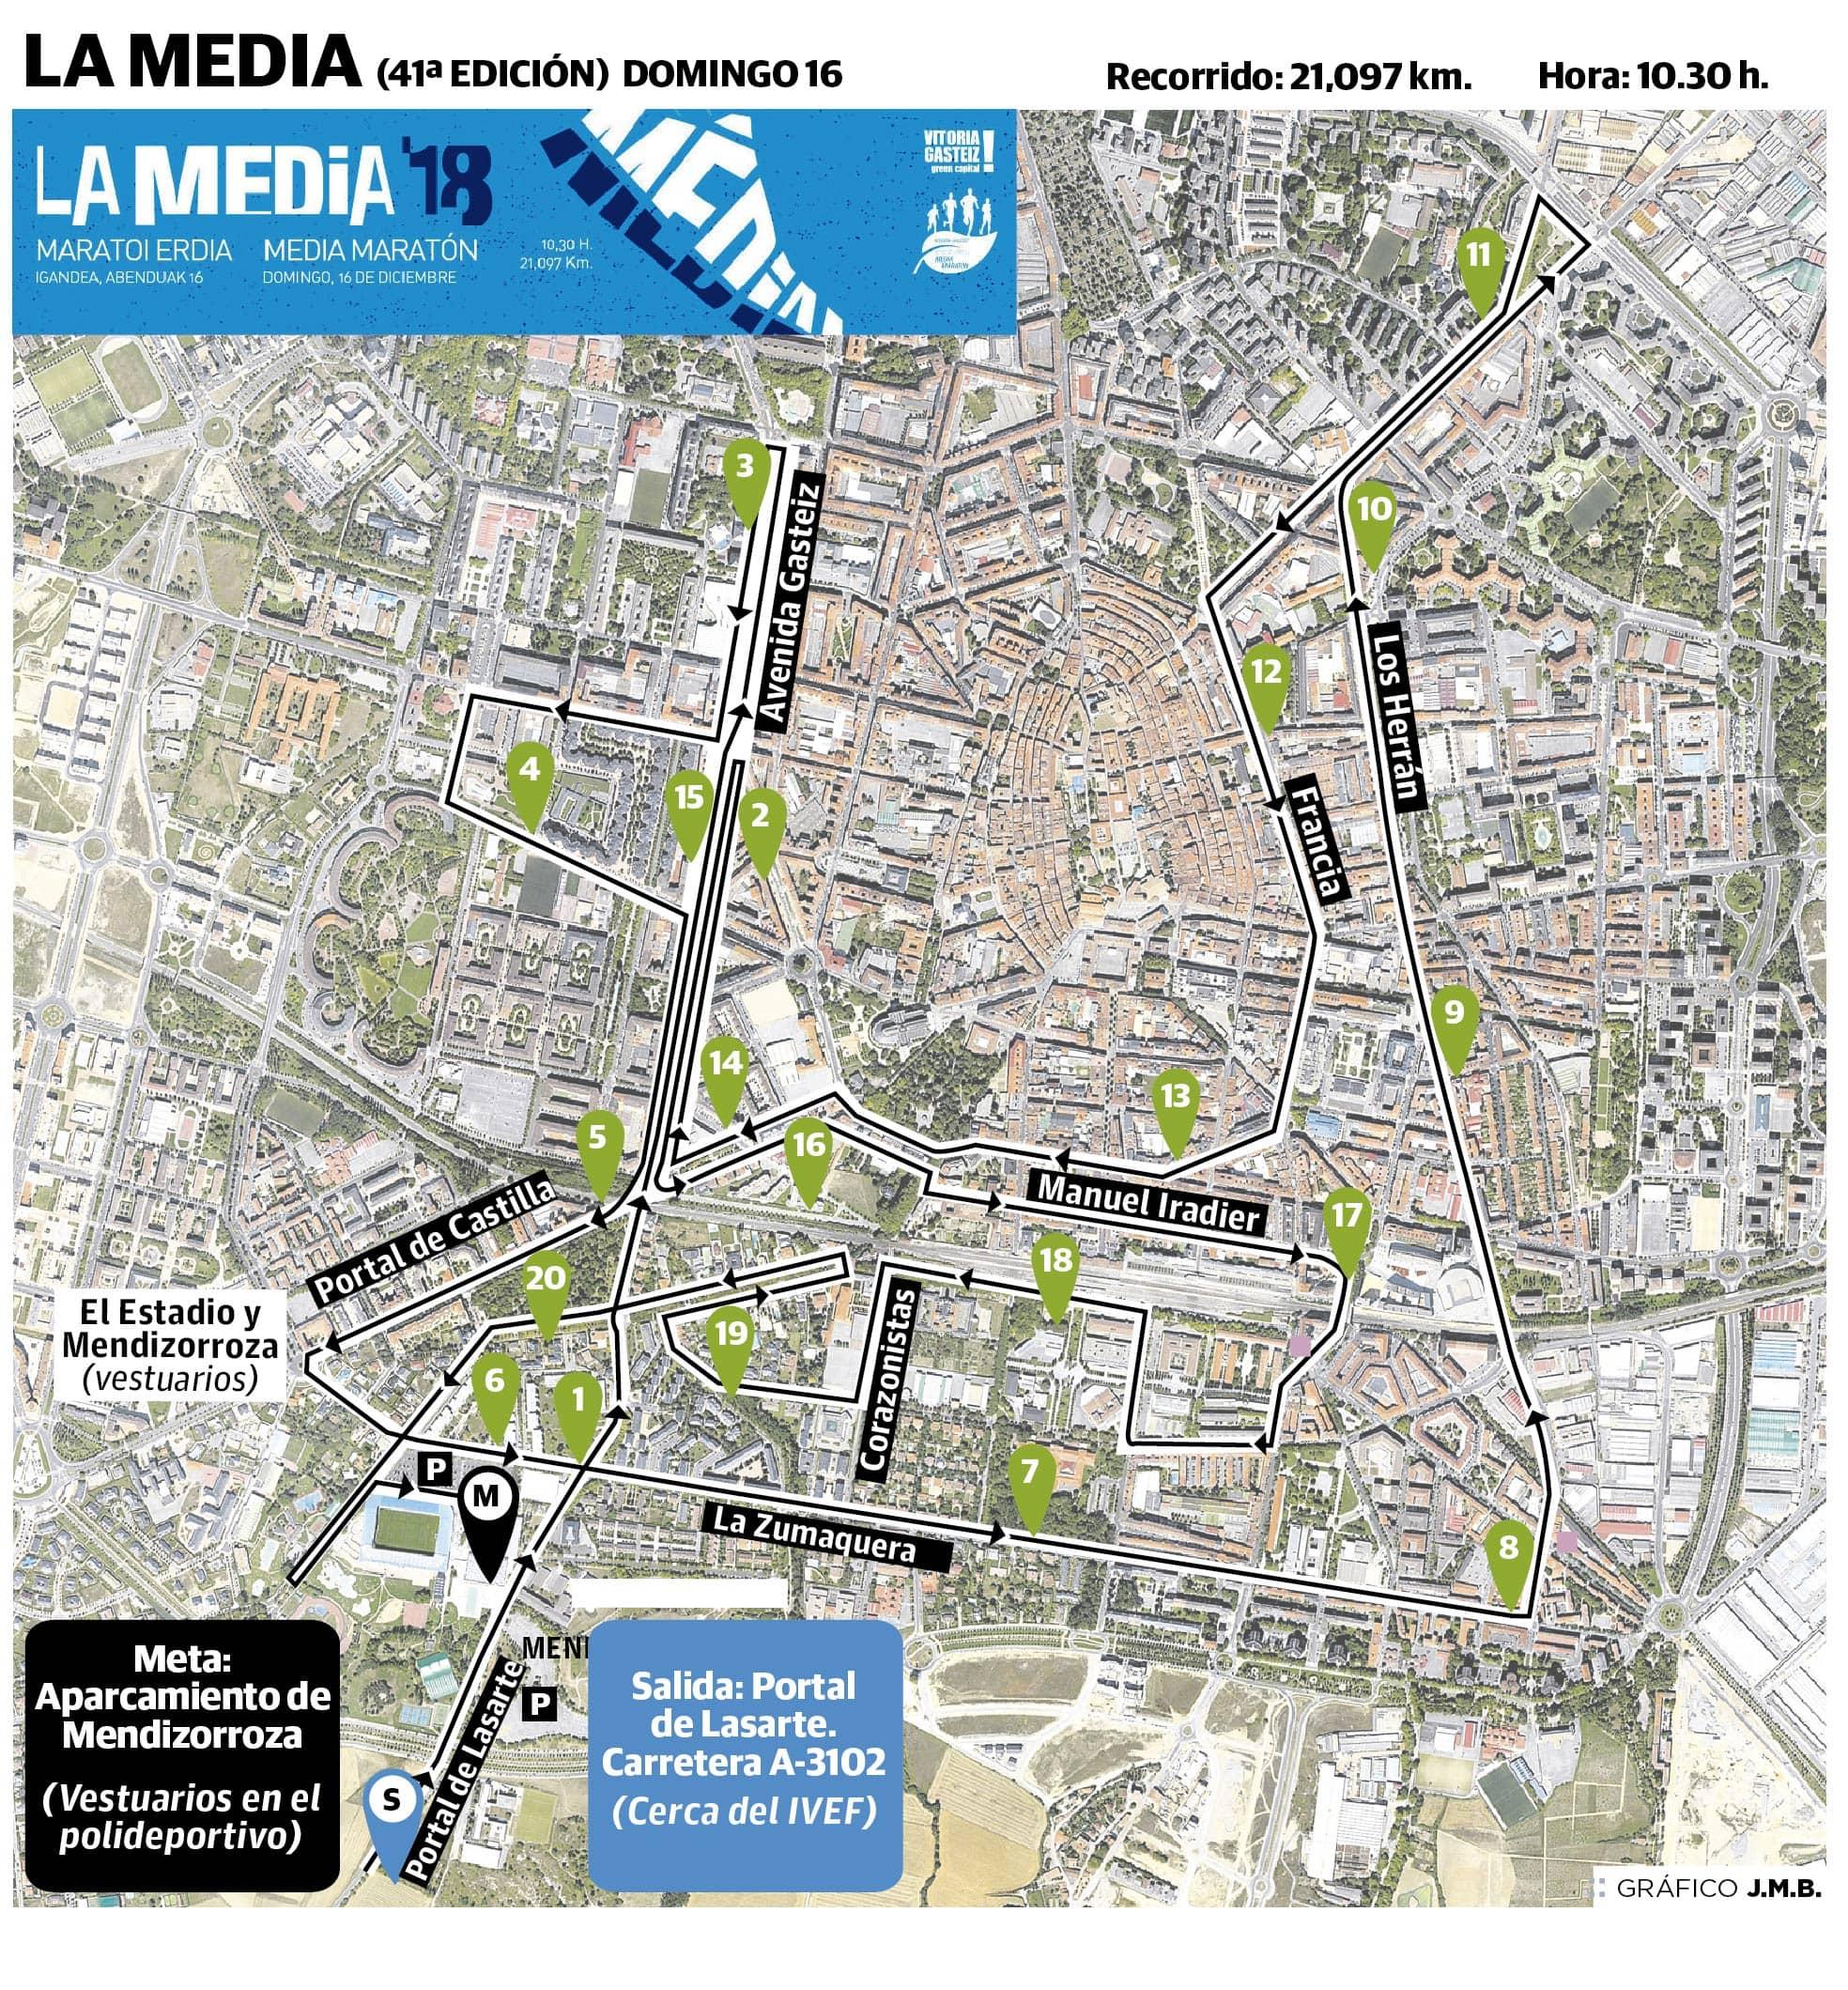 Recorrido de la 41 Media Maratón de Vitoria 2018